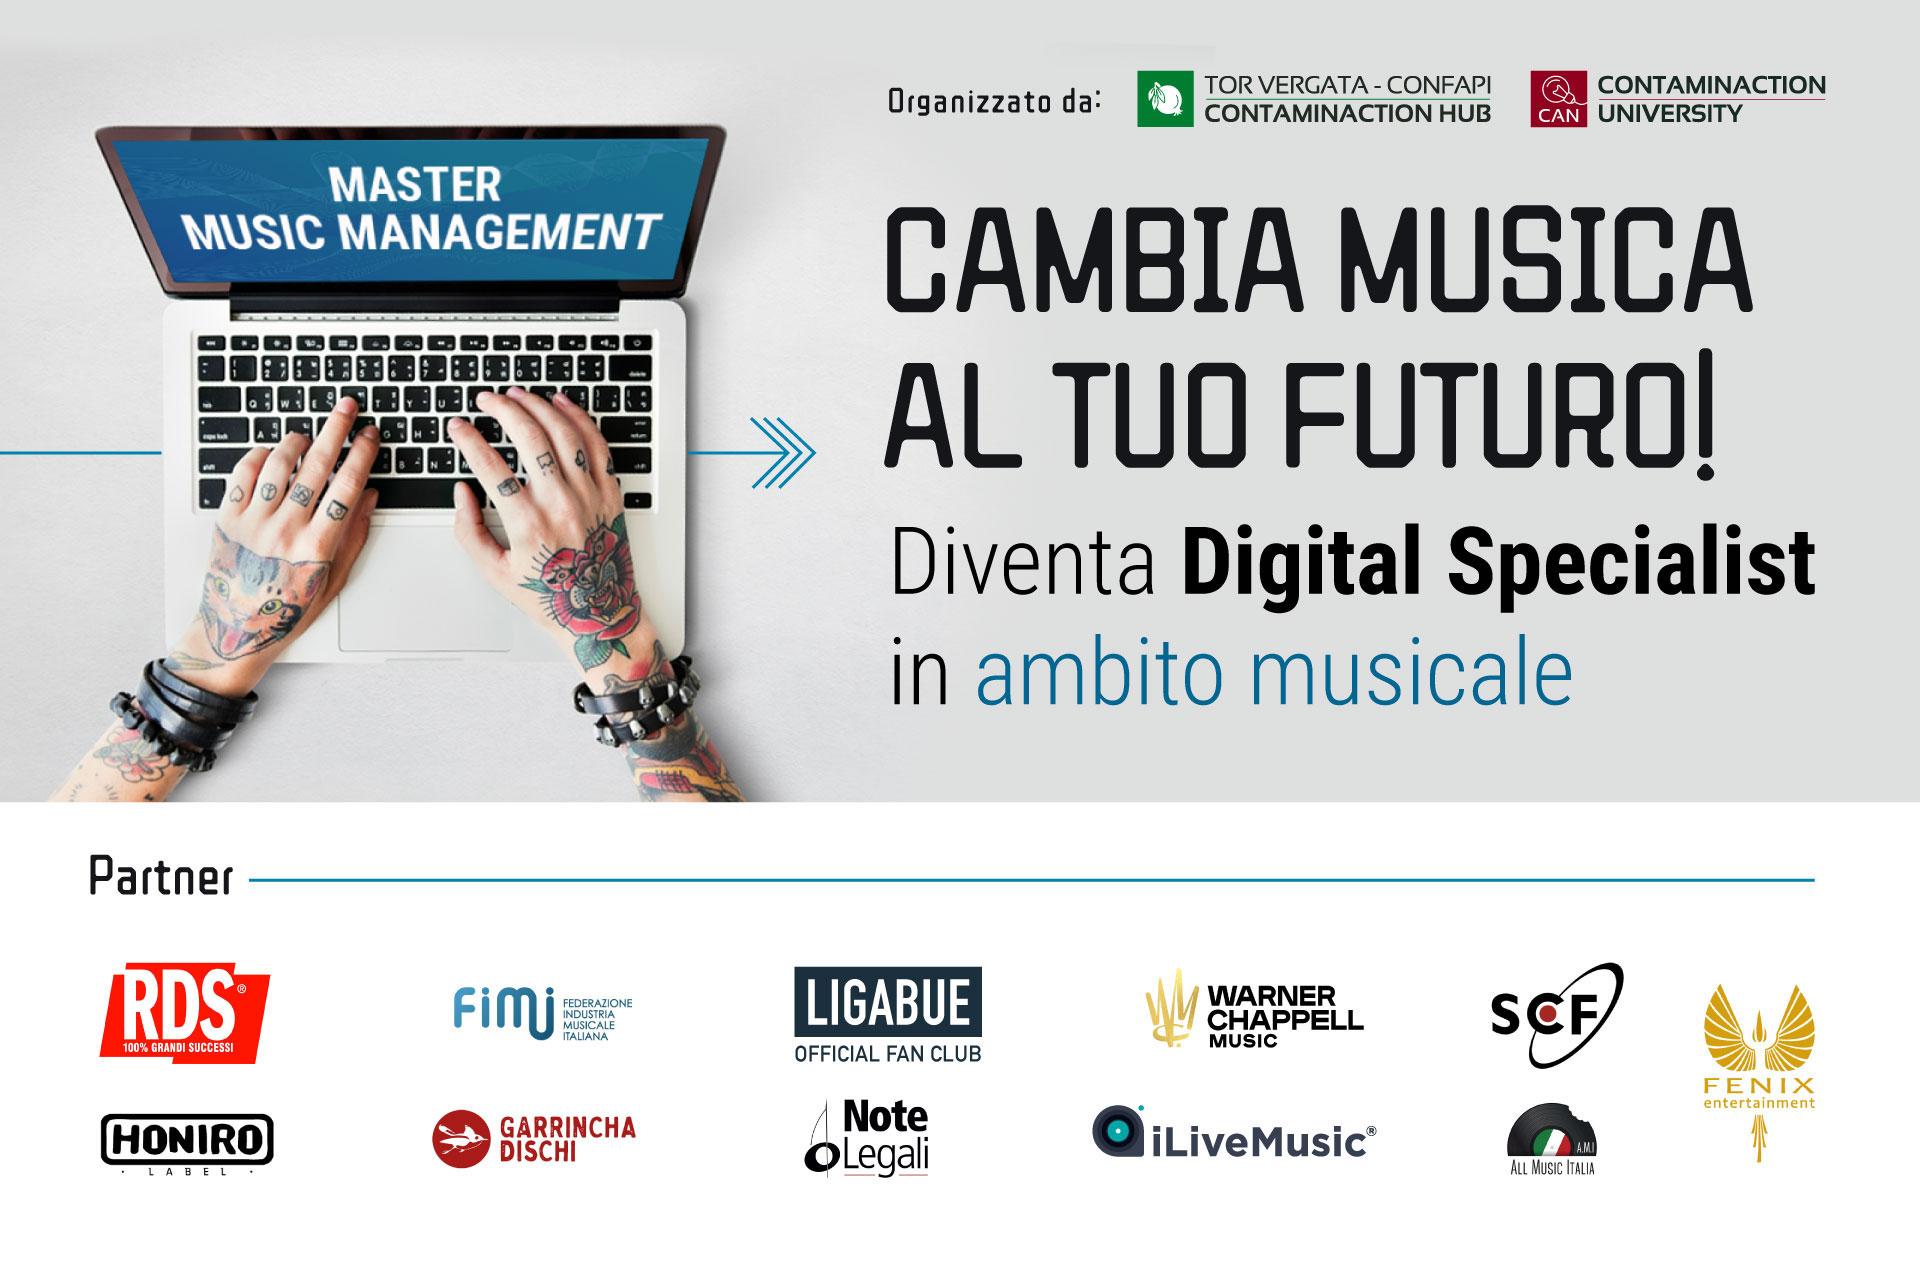 master music management rds warner chappell music fimi honiro